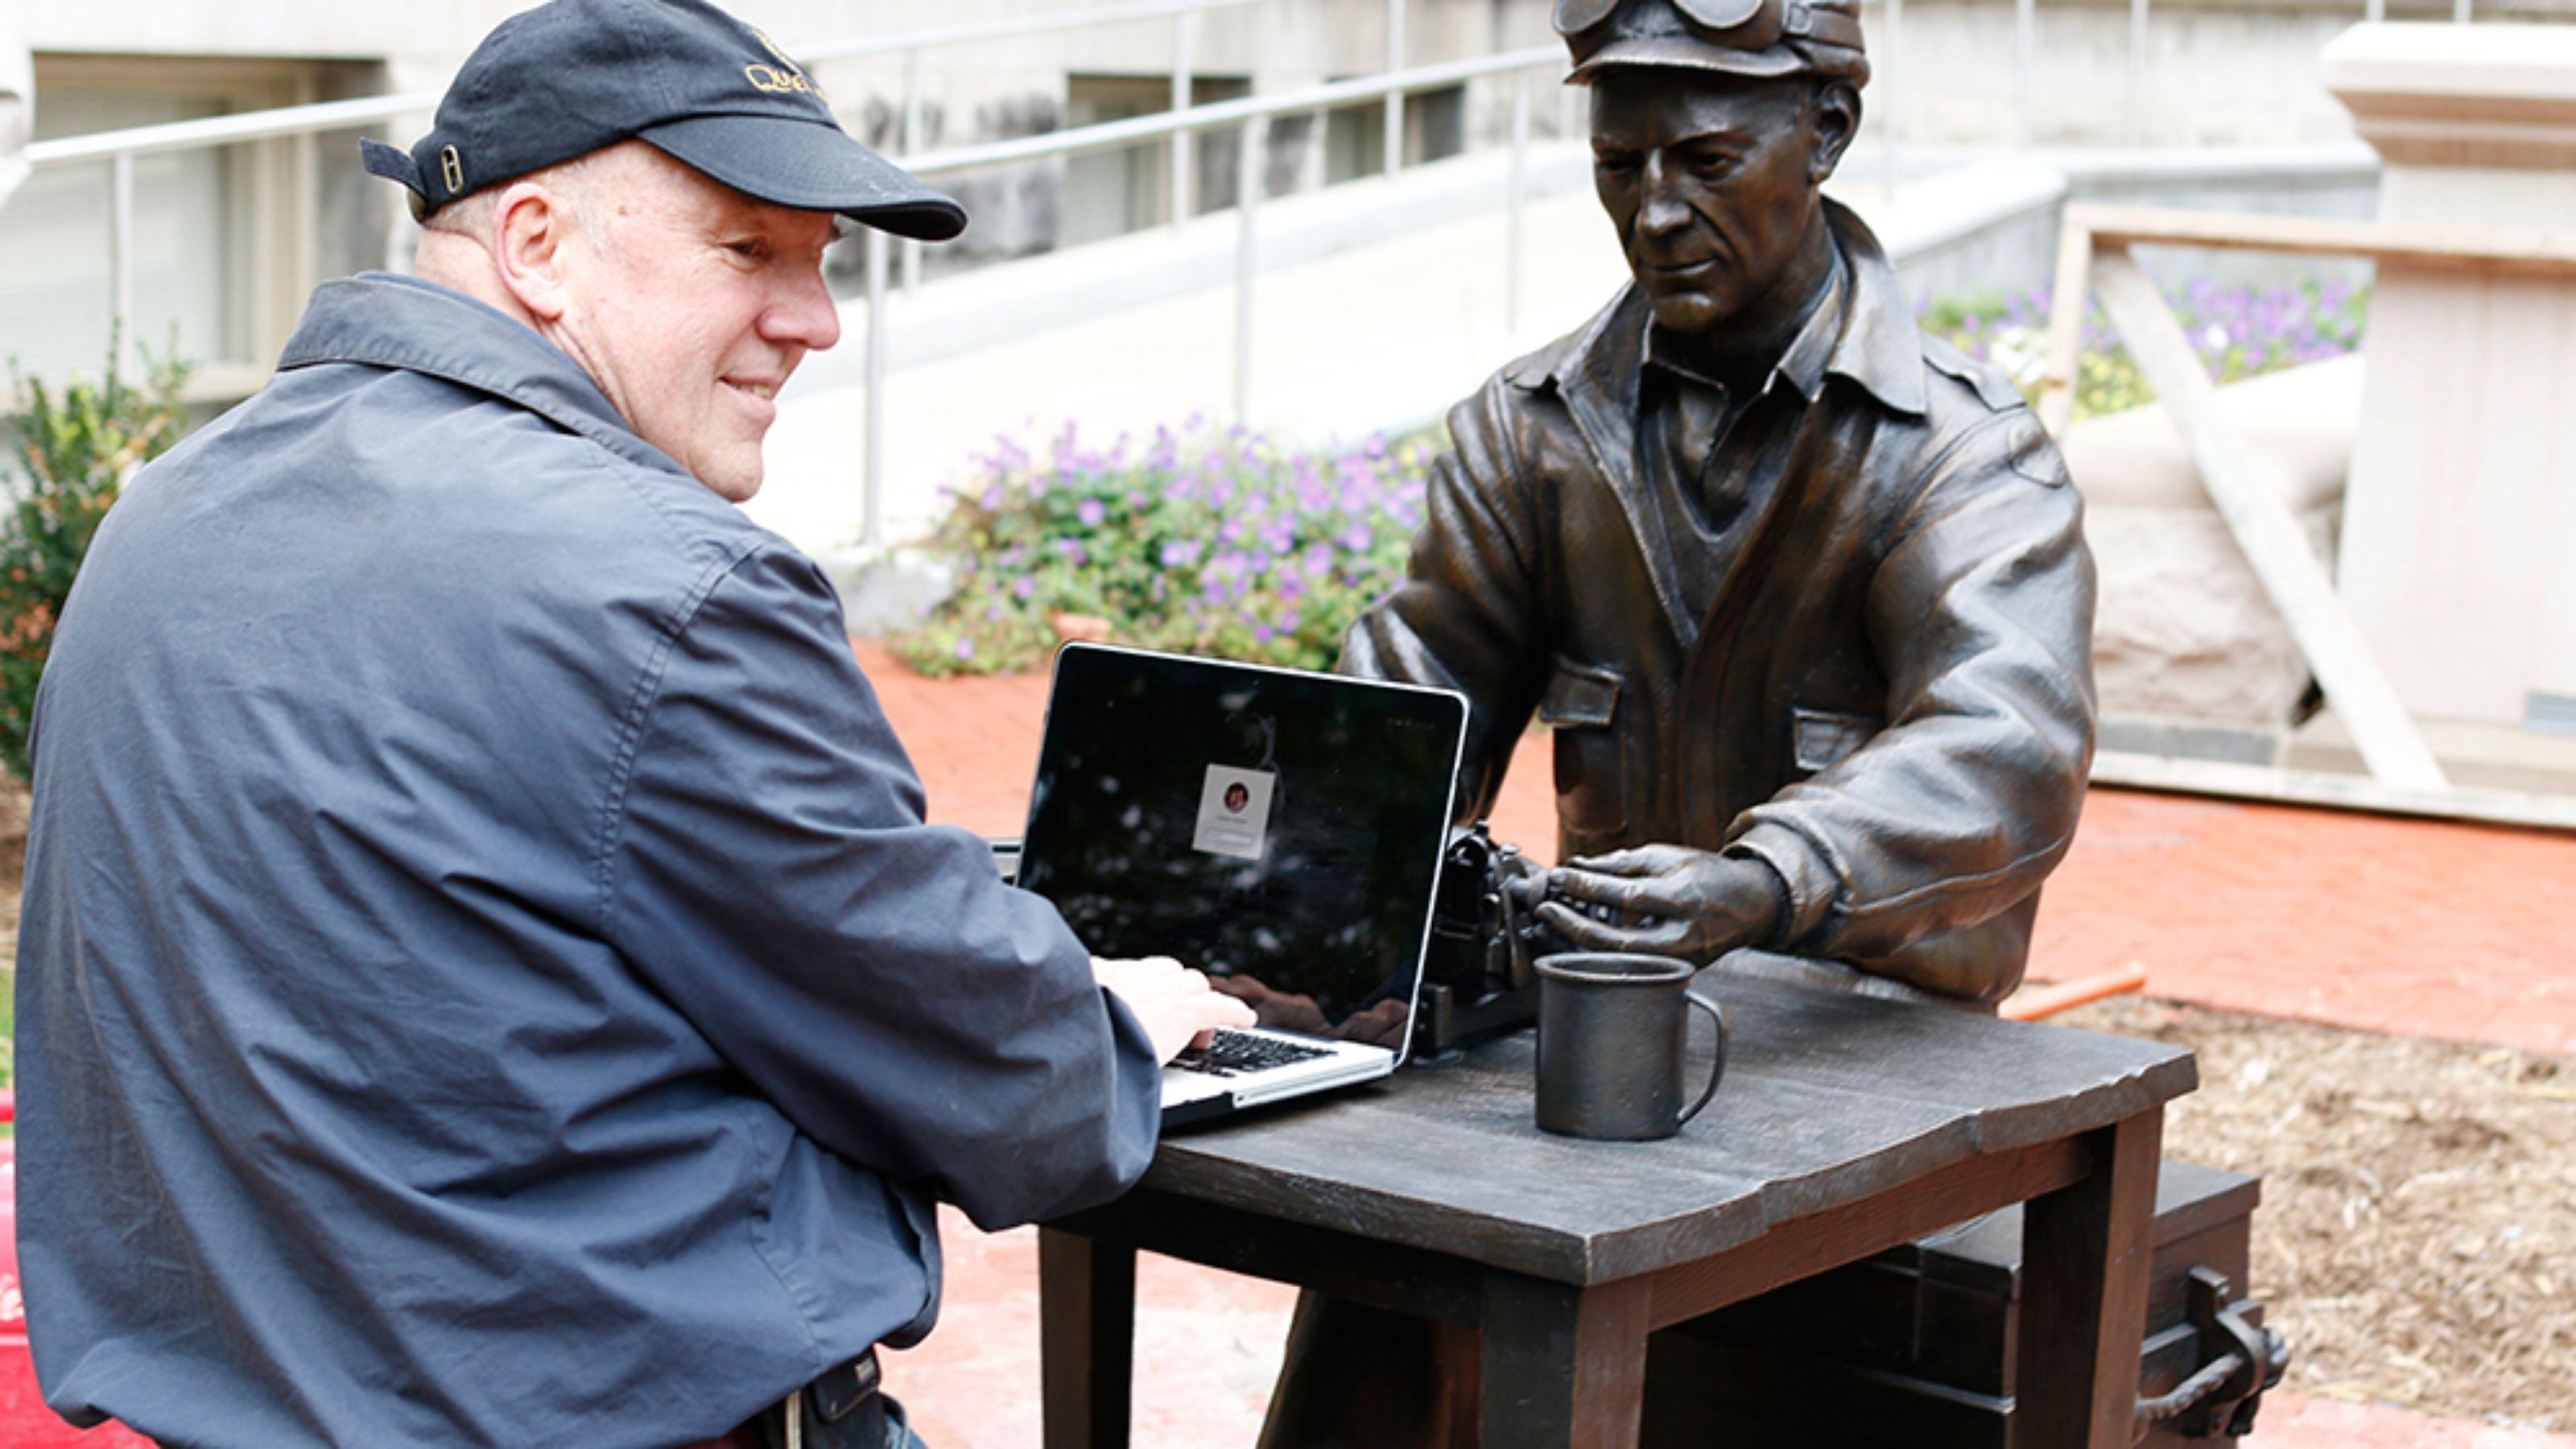 University statue of famed war journalist has a typo